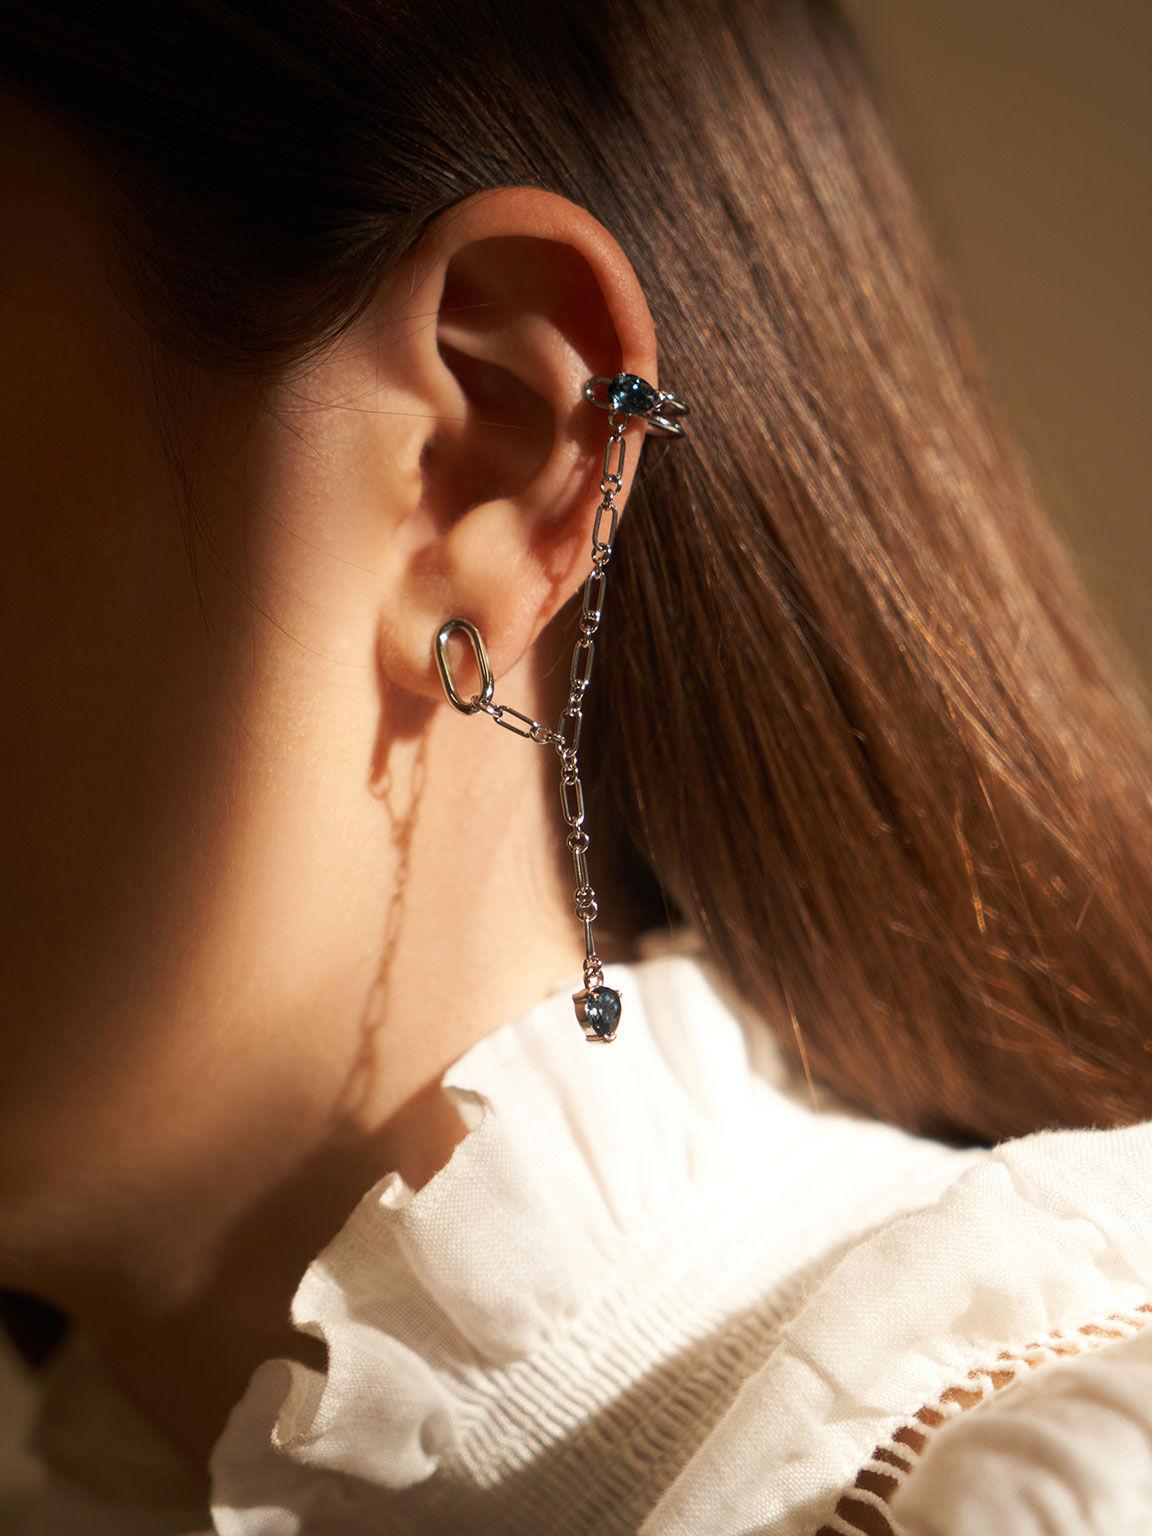 Crystal Embellished Ear Cuff Drop Earrings, Silver, hi-res